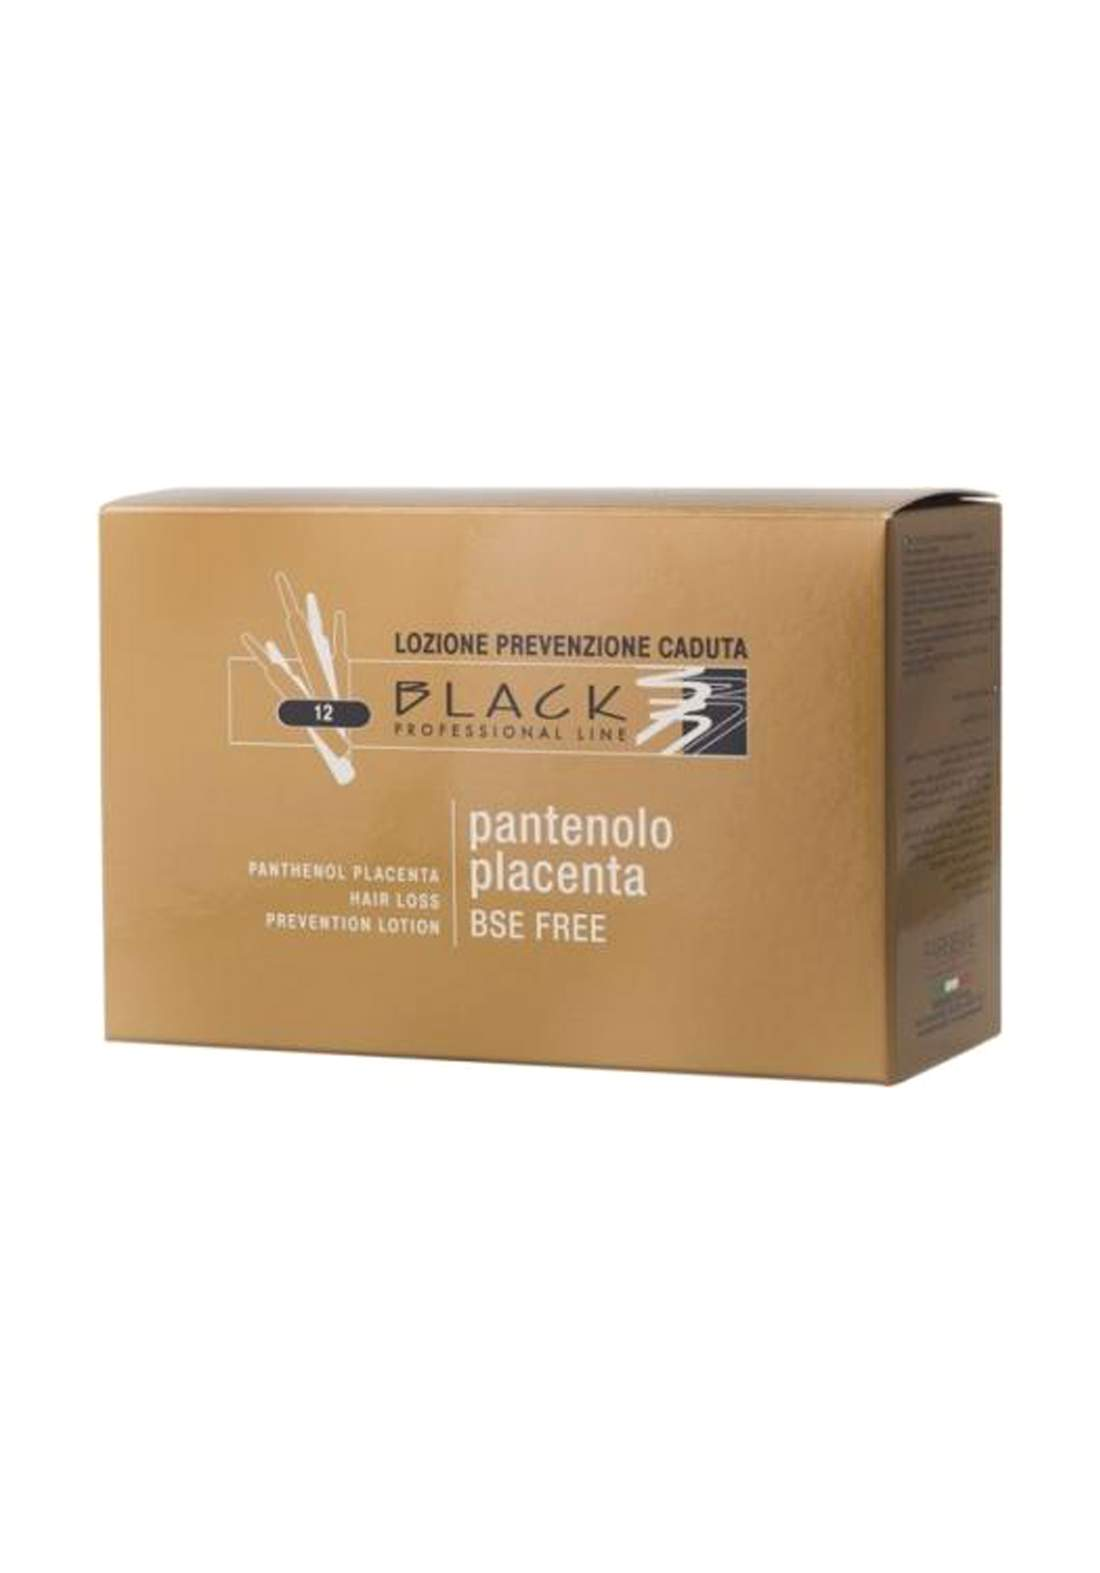 Black Professional Fiale Black Placenta Pantenolo 10ml  امبولات للشعر